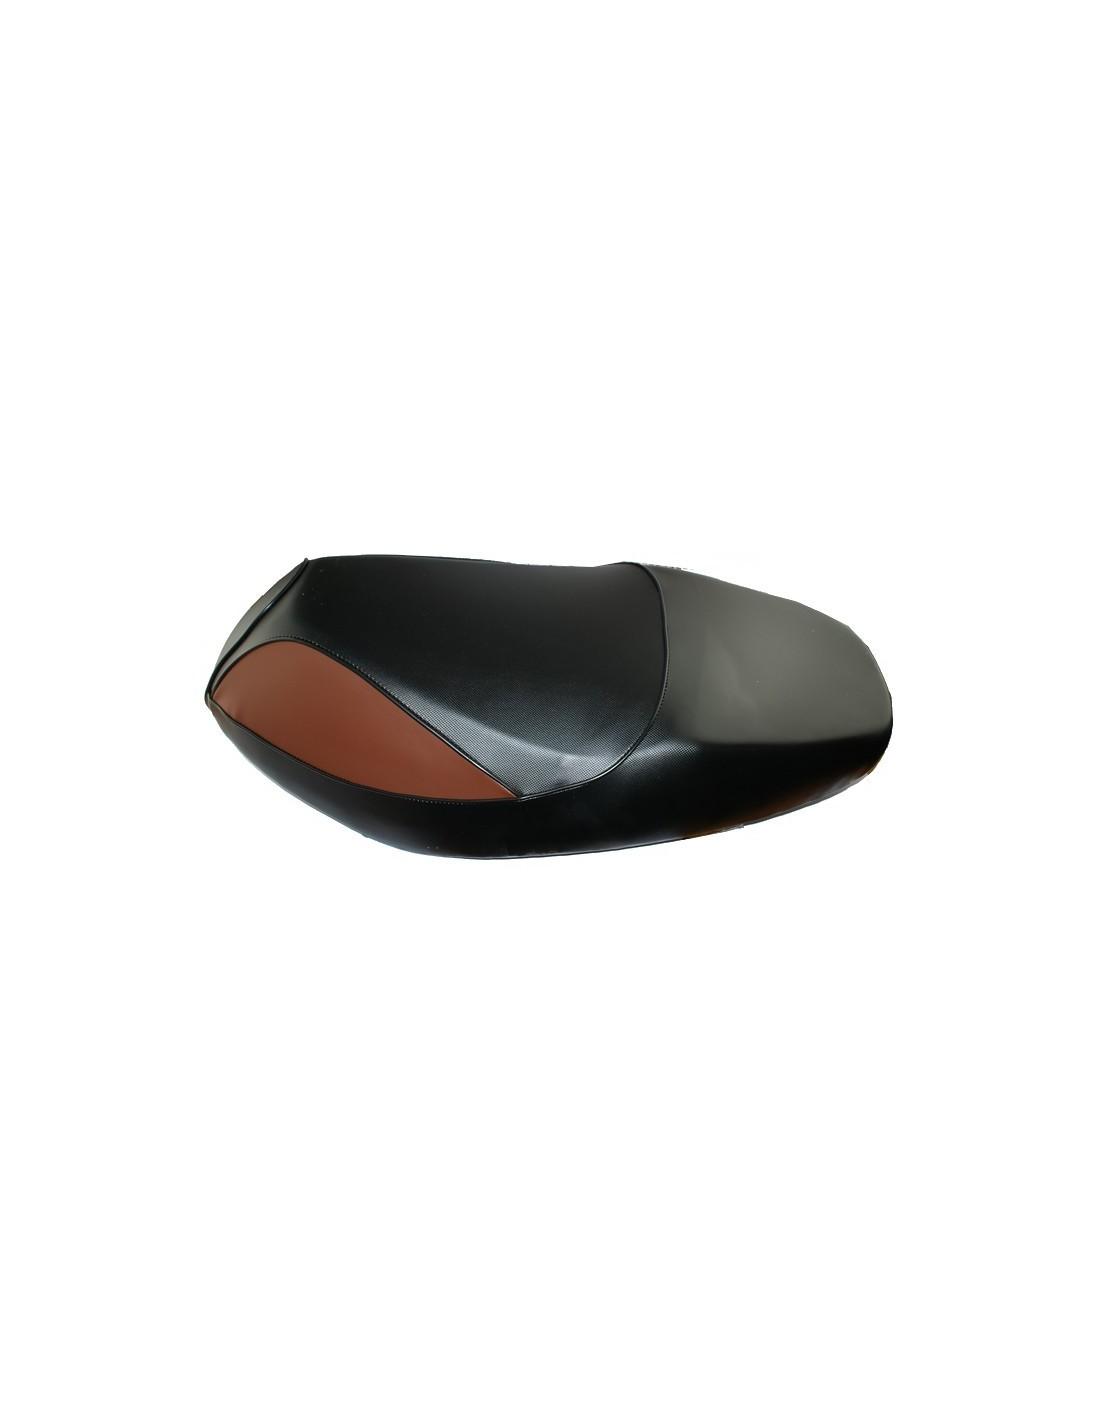 siodło , siedzenie , kanapa Romet 727 Komfort